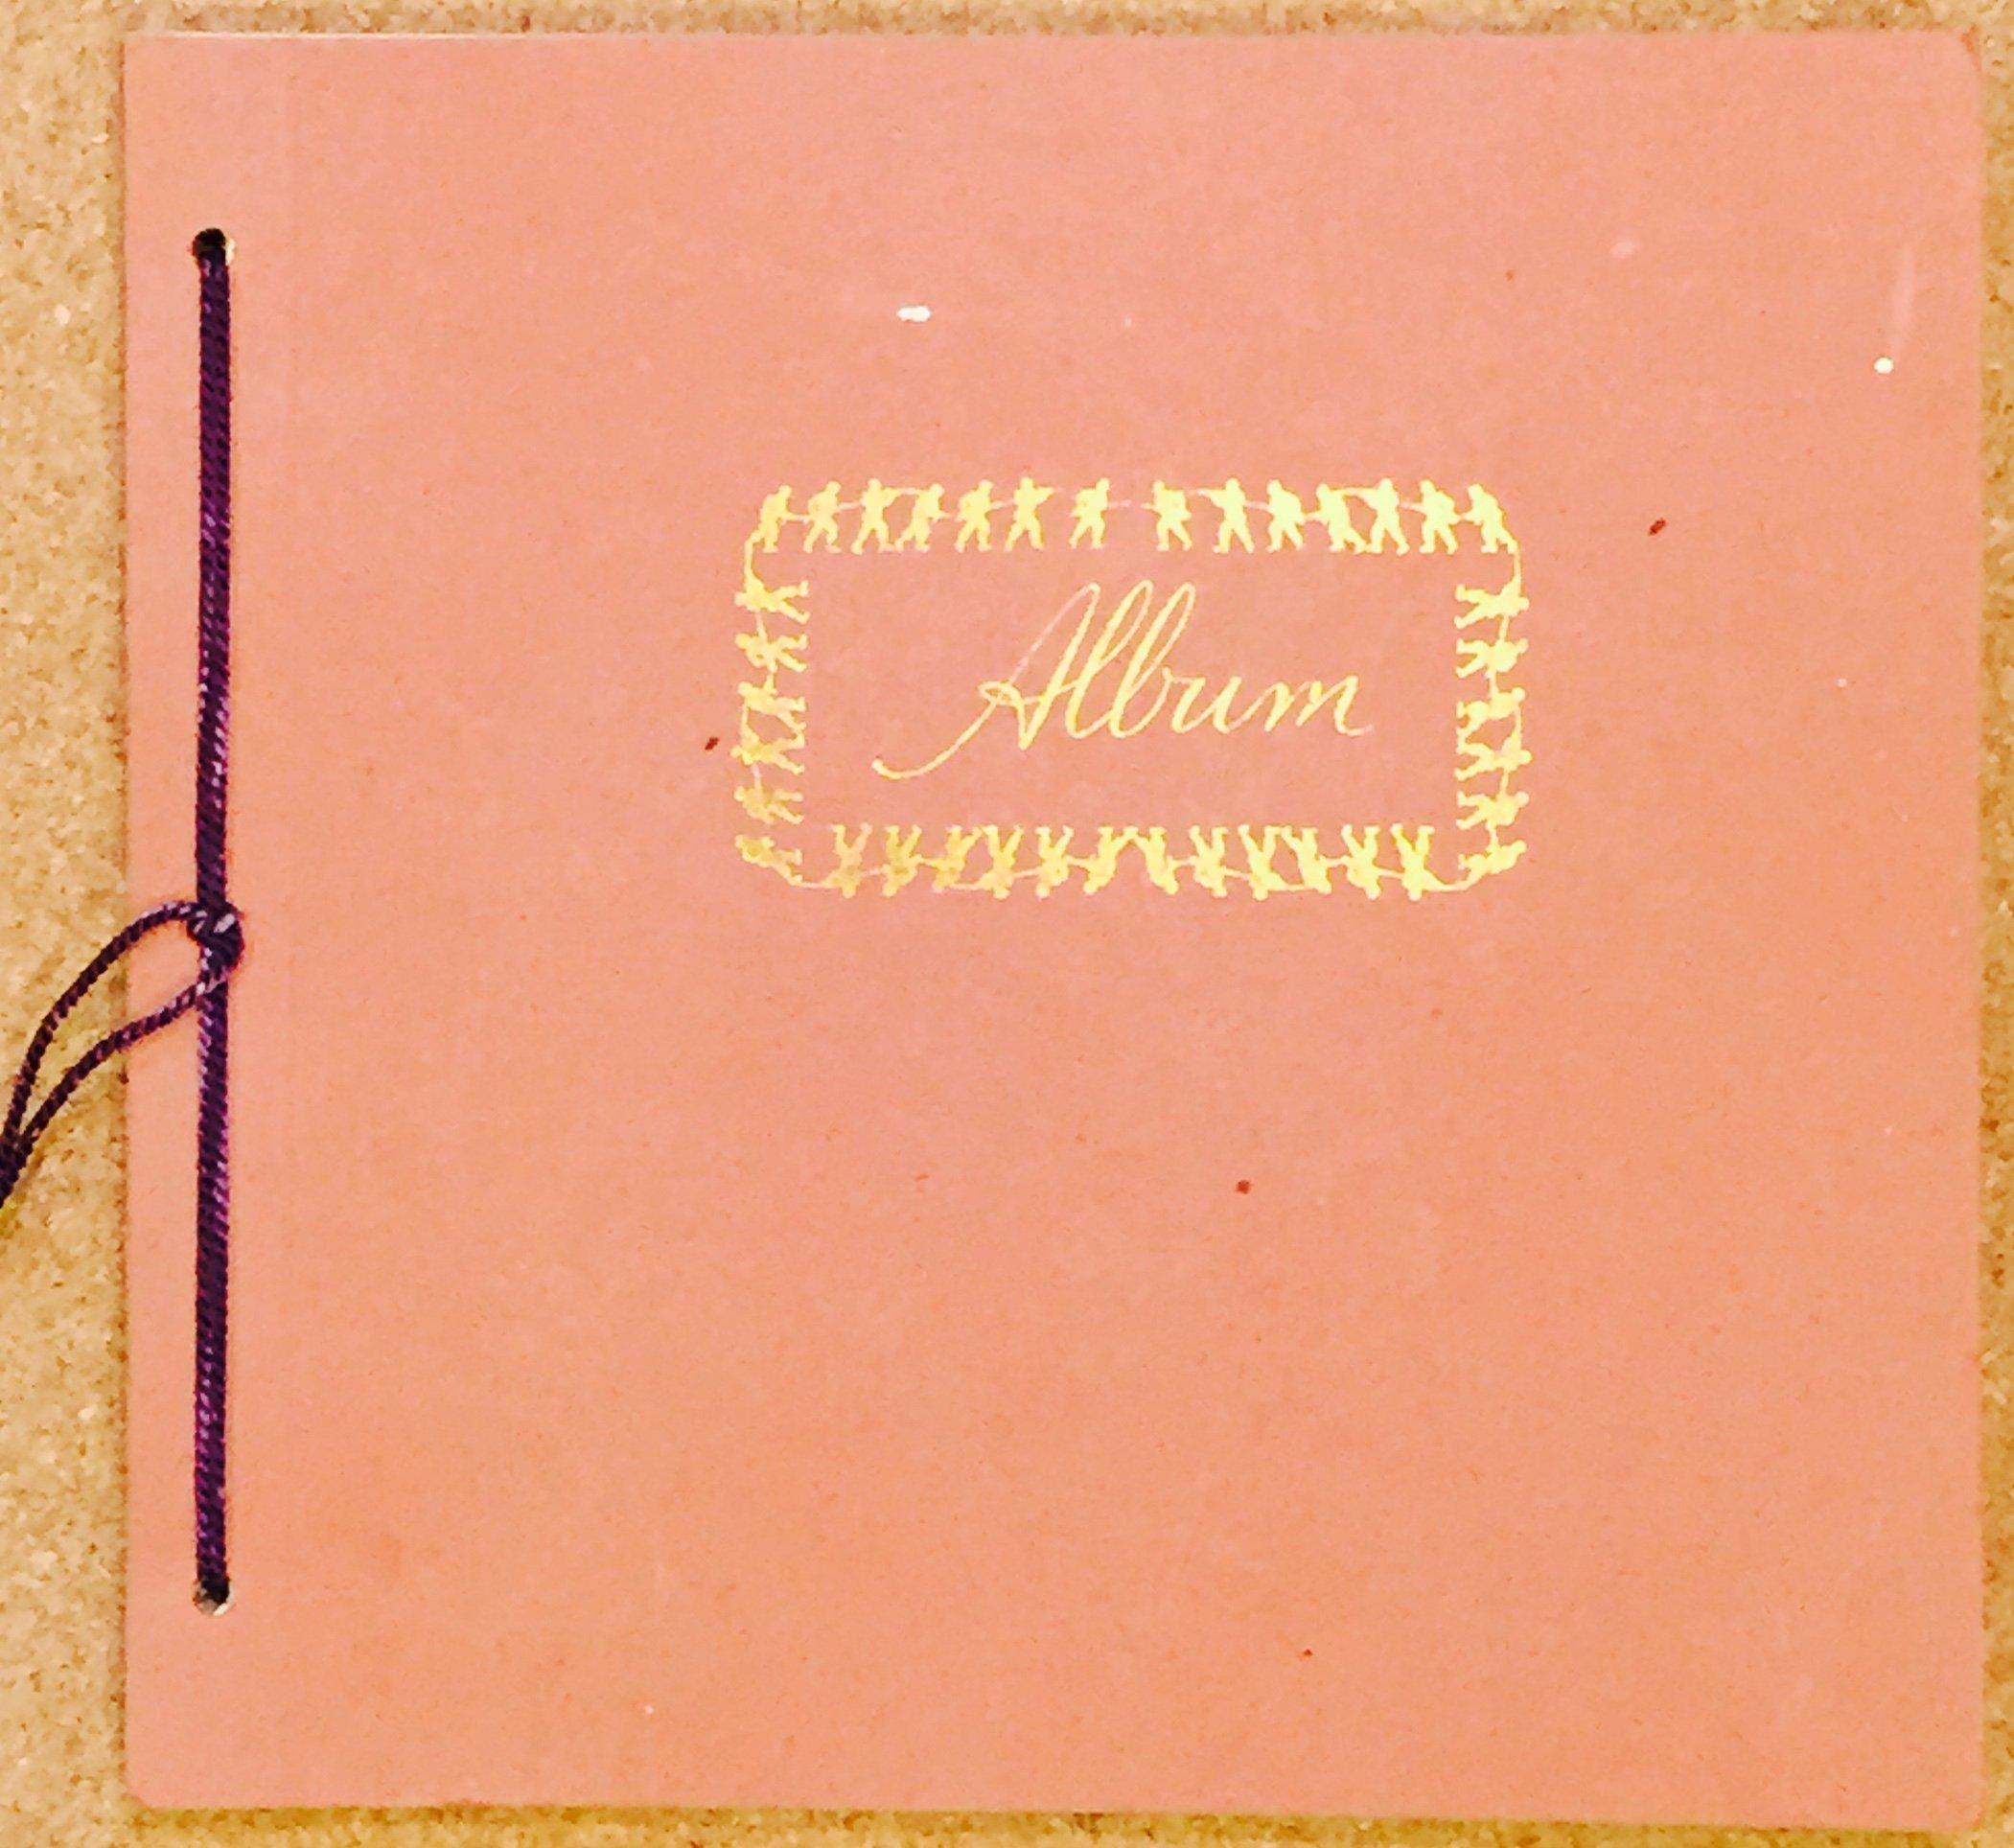 Amazon.com: Antoni Miralda: Album: Antoni Miralda: Books